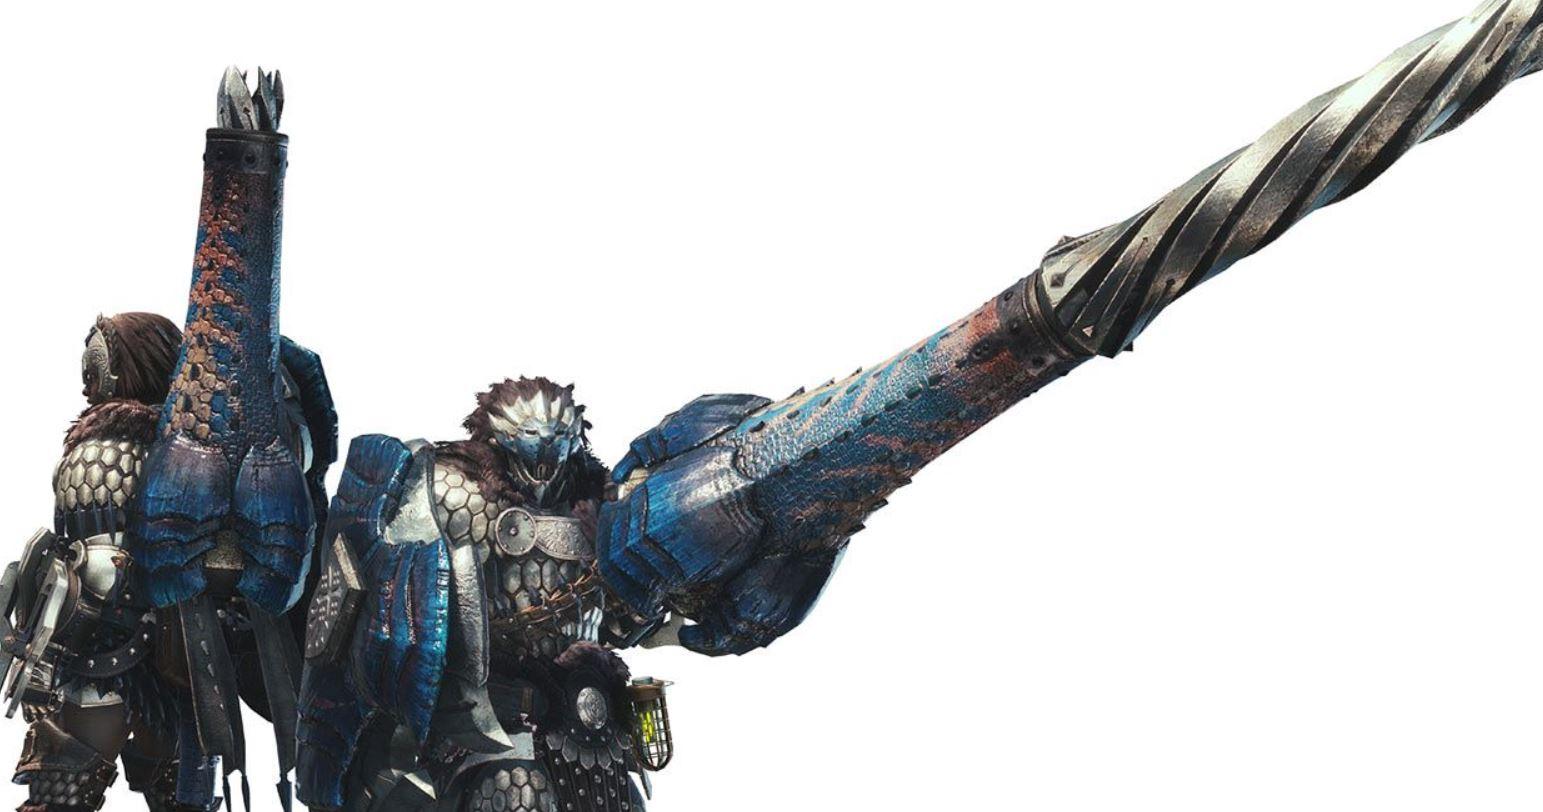 MHW Weapon Tier List